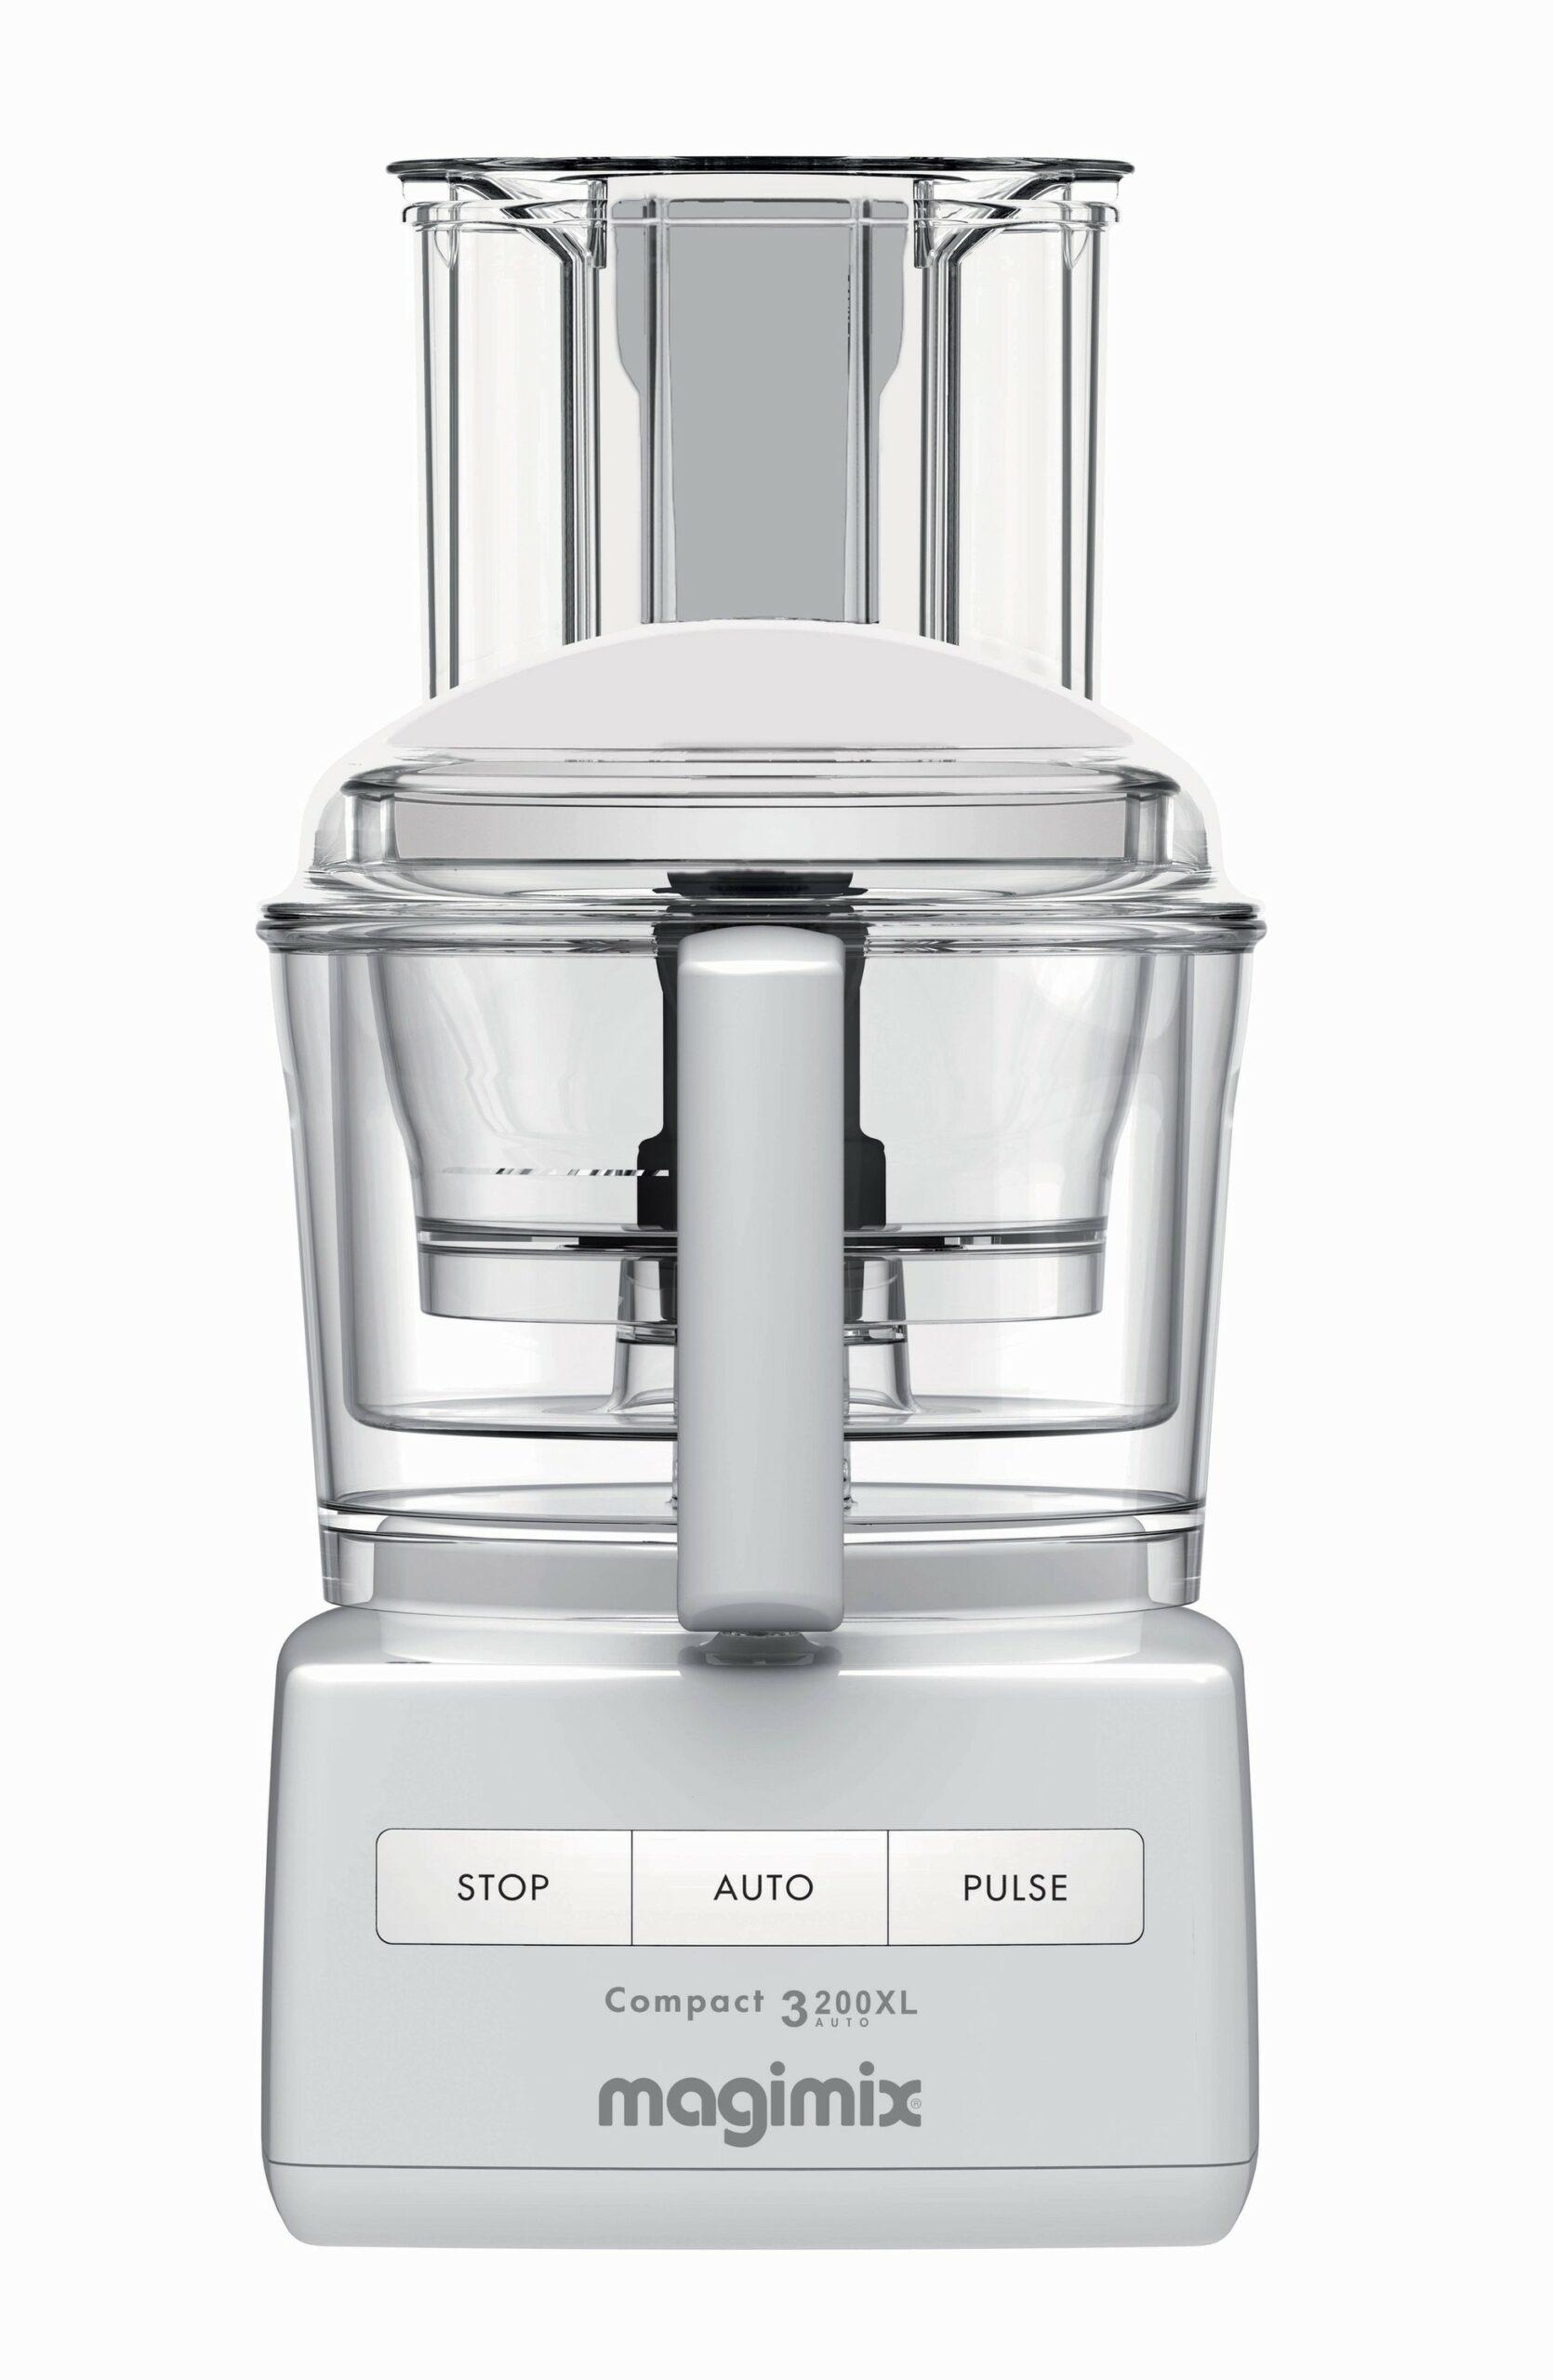 Magimix 3200XL Food Processor White